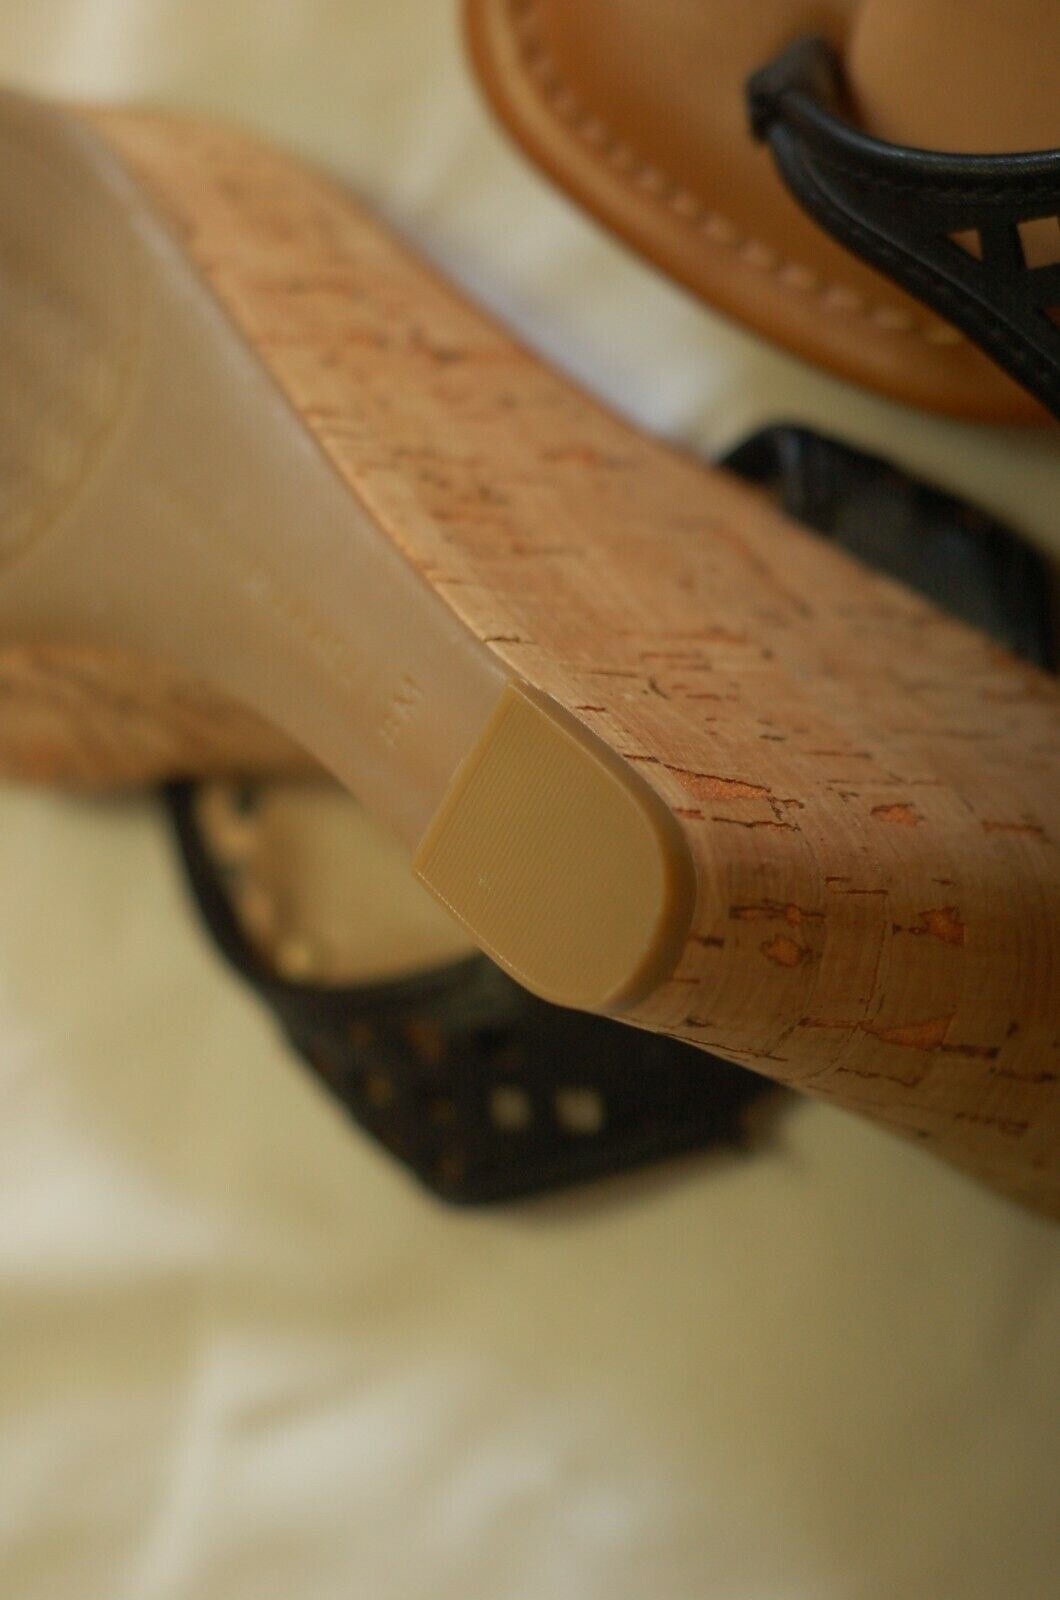 Tommy Hilfiger Black Leather Thong Sandals Cork W… - image 9